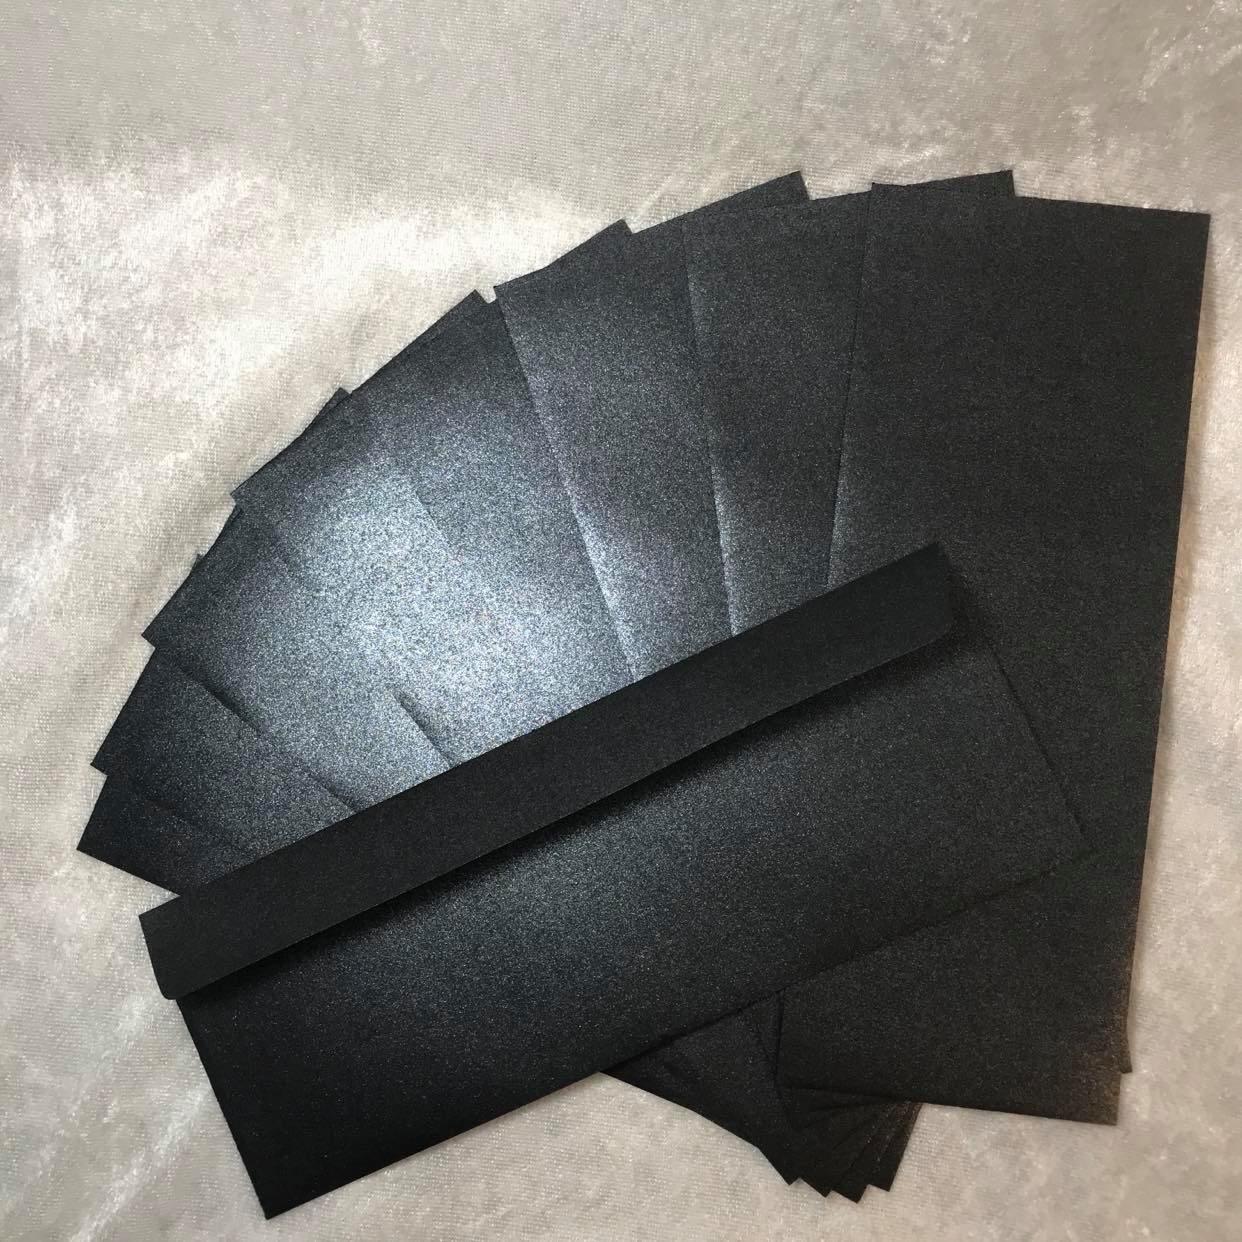 10 stk Konvolutter til slimcard . Shimmer mørk blå. TILBUDSPRIS kun kr 25,- pr pk.